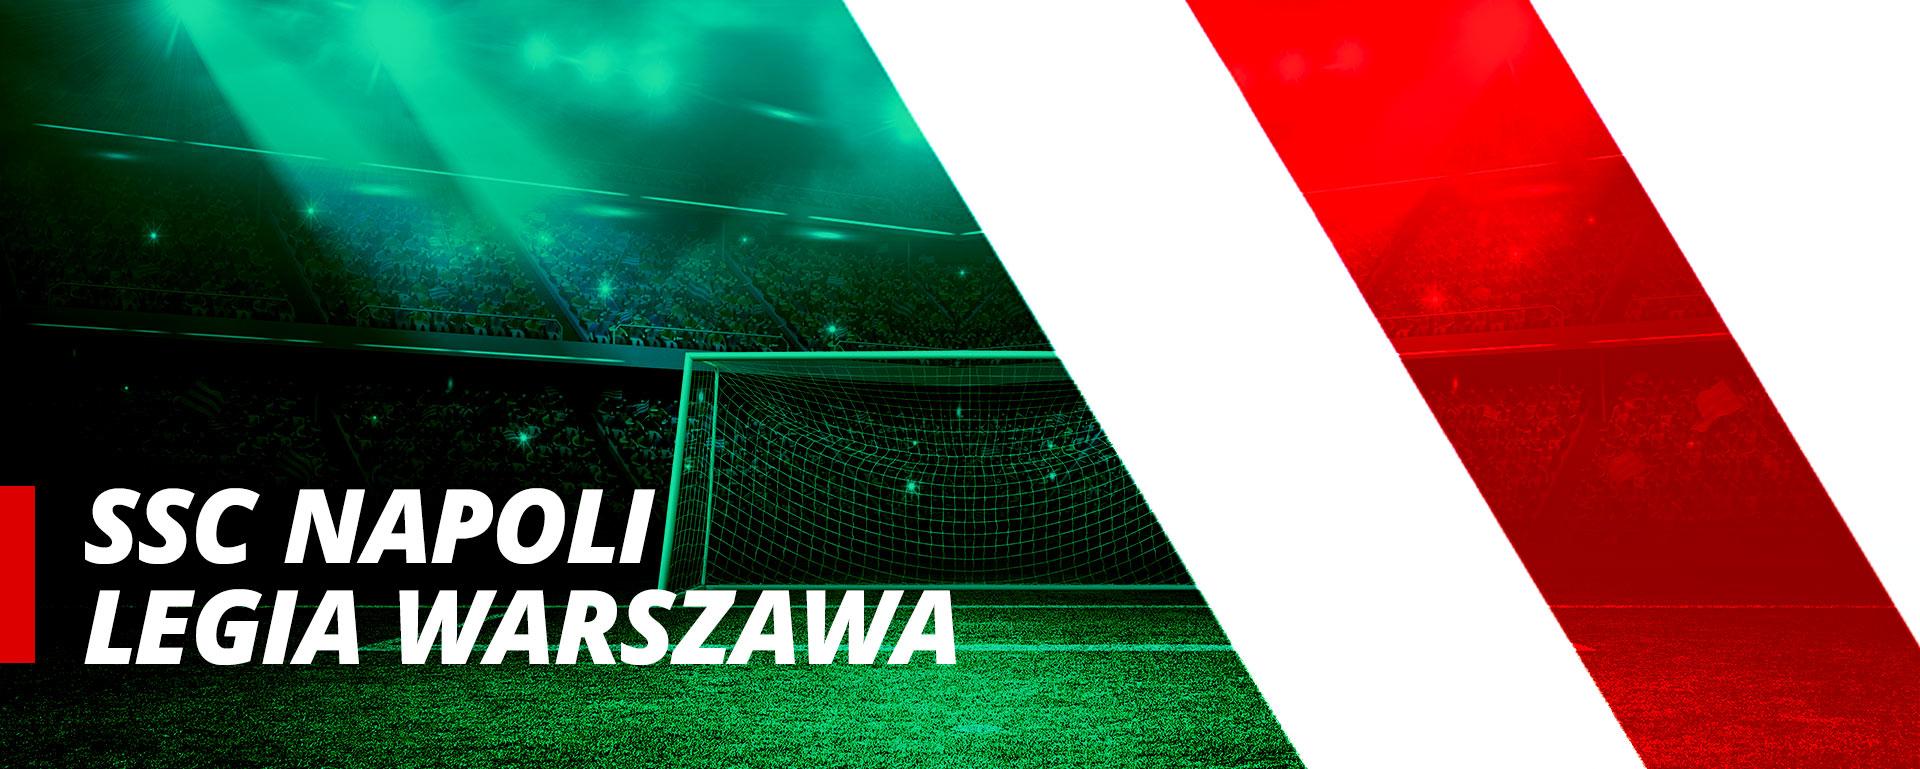 Legia Warszawa w grupie C Ligi Europy UEFA mecz: SSC Napoli – Legia Warszawa